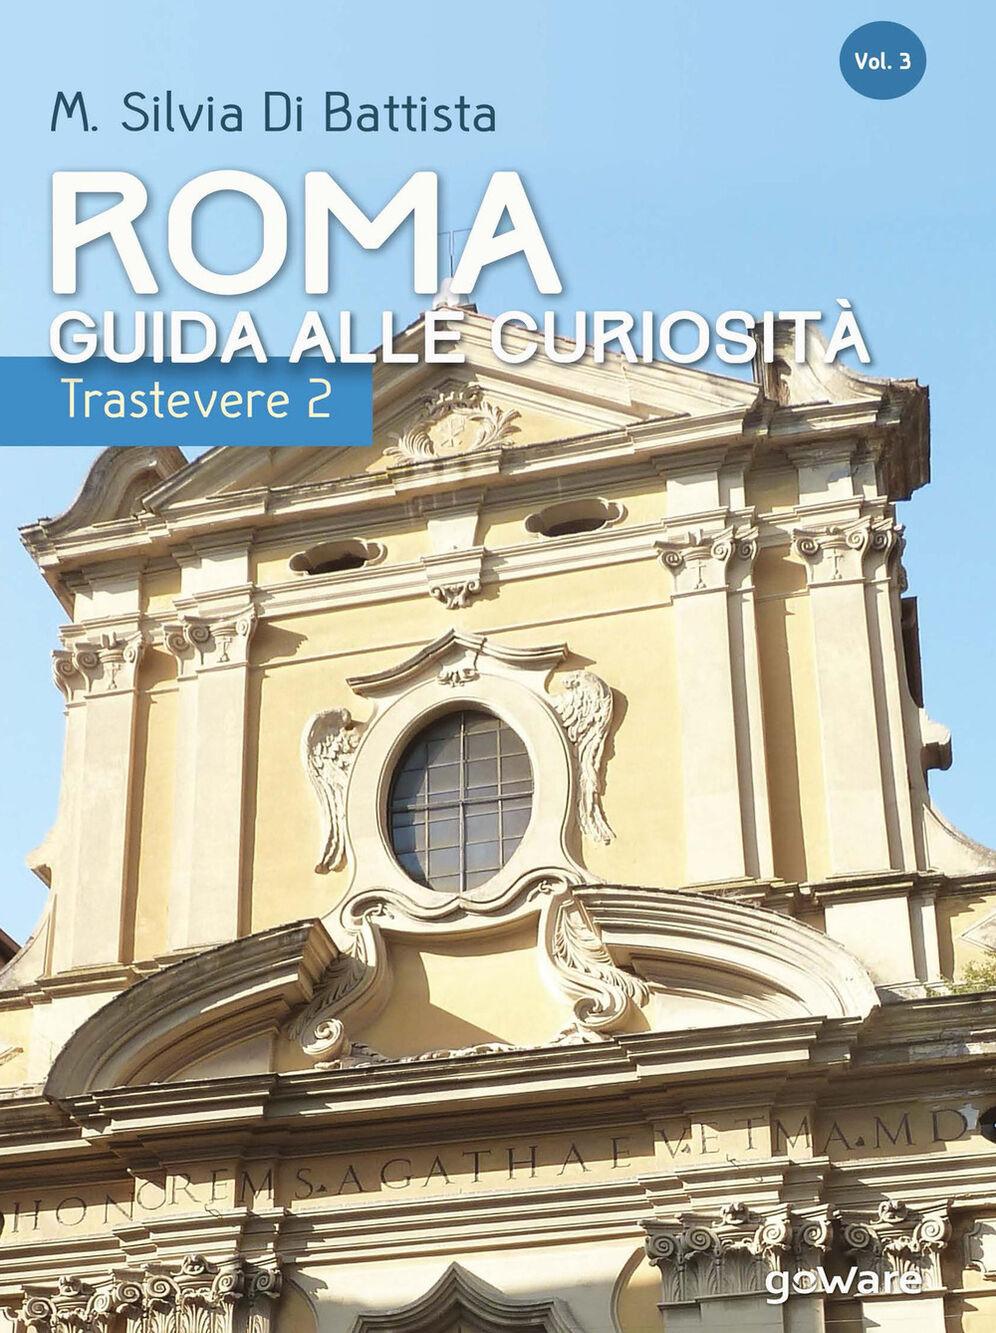 Roma: guida alle curiosità. Trastevere. Vol. 2